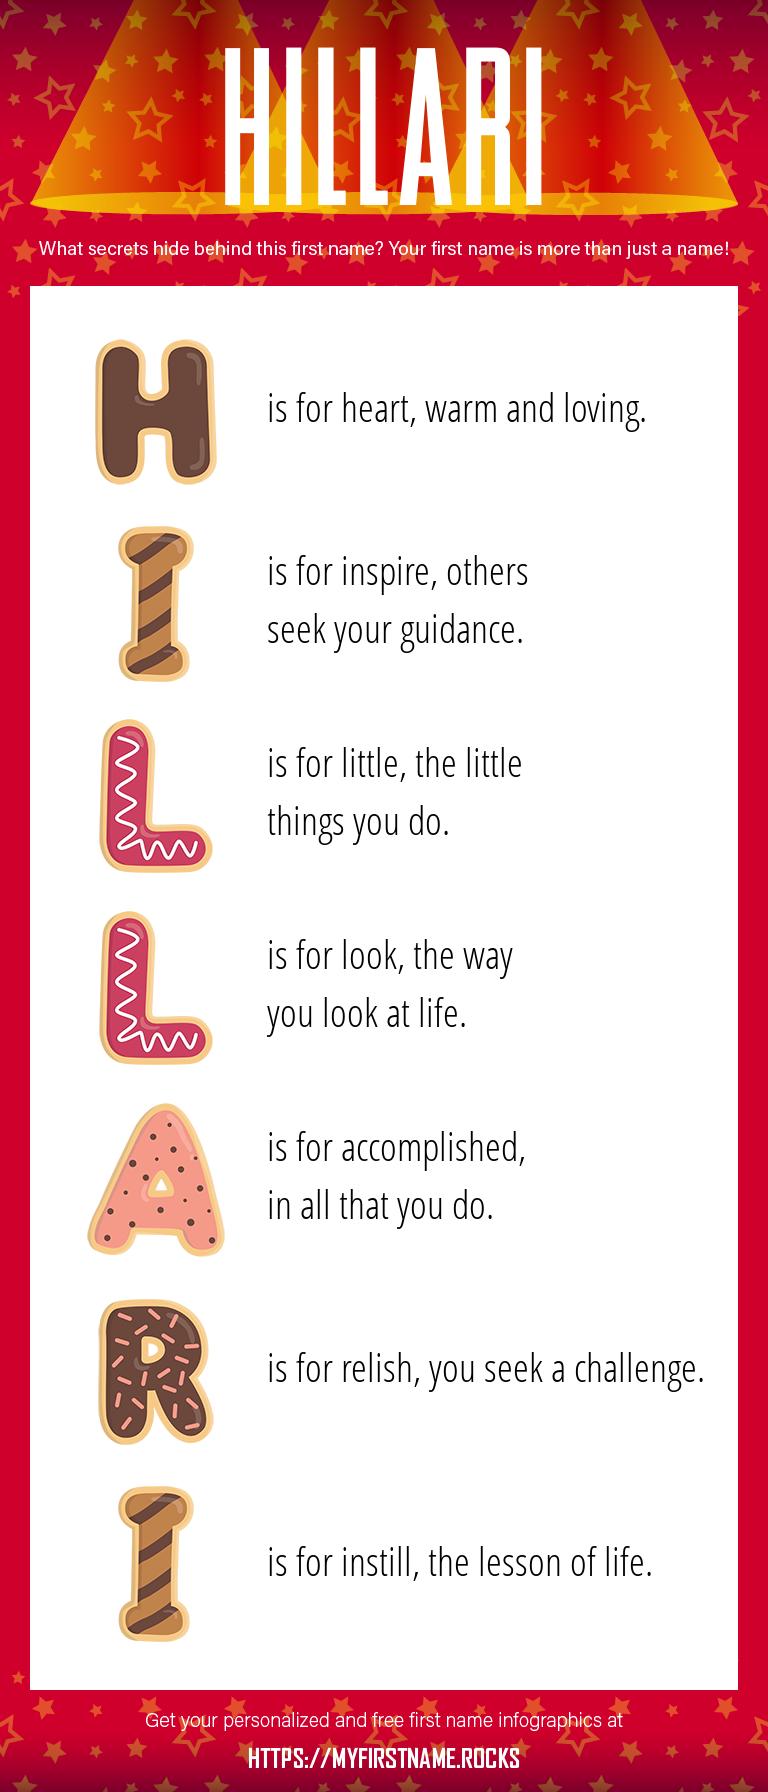 Hillari Infographics